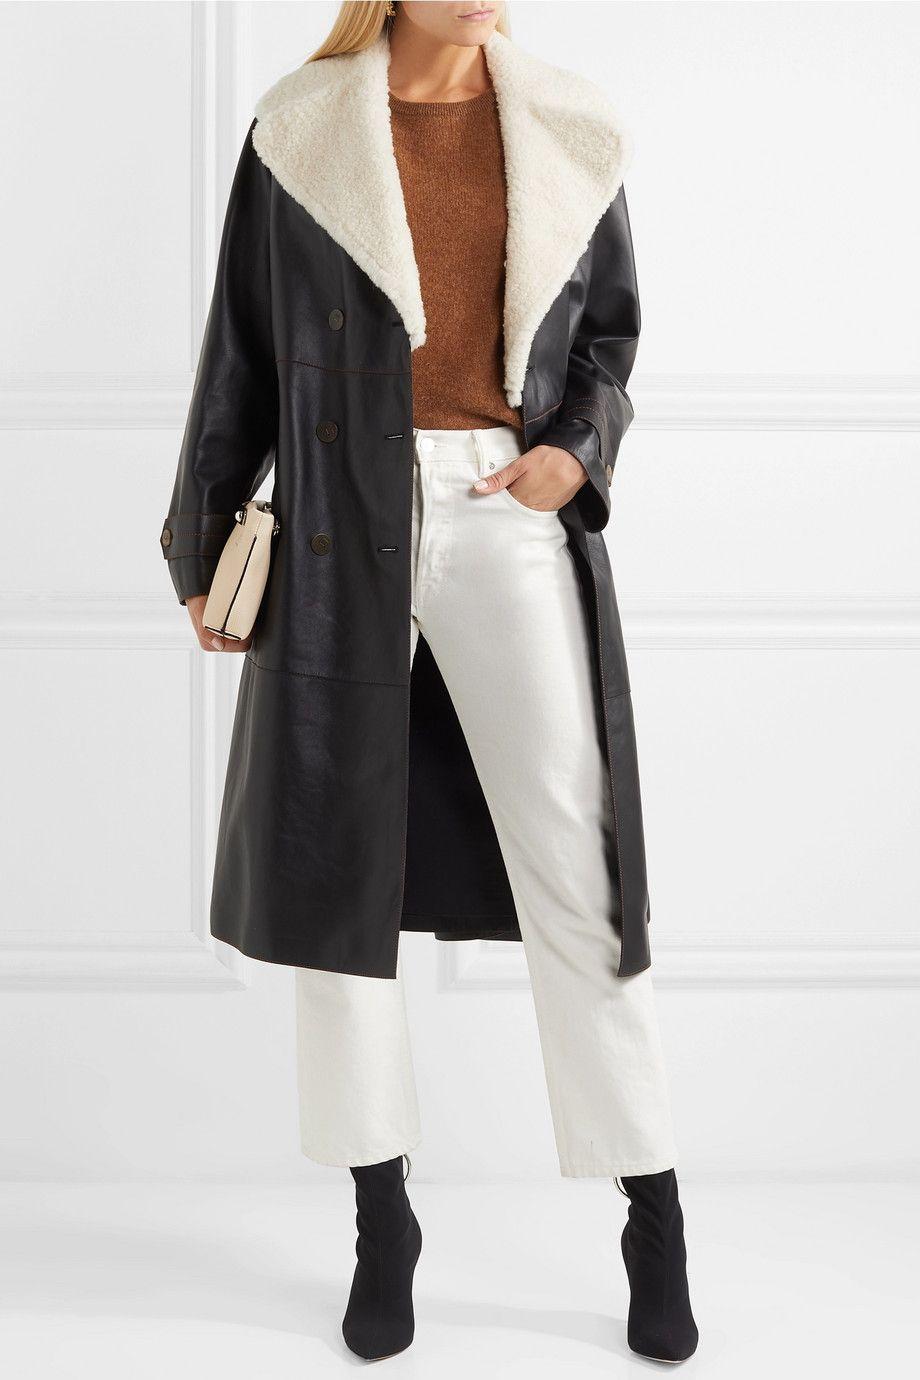 Loewe | Belted shearling trimmed leather coat | NET A PORTER